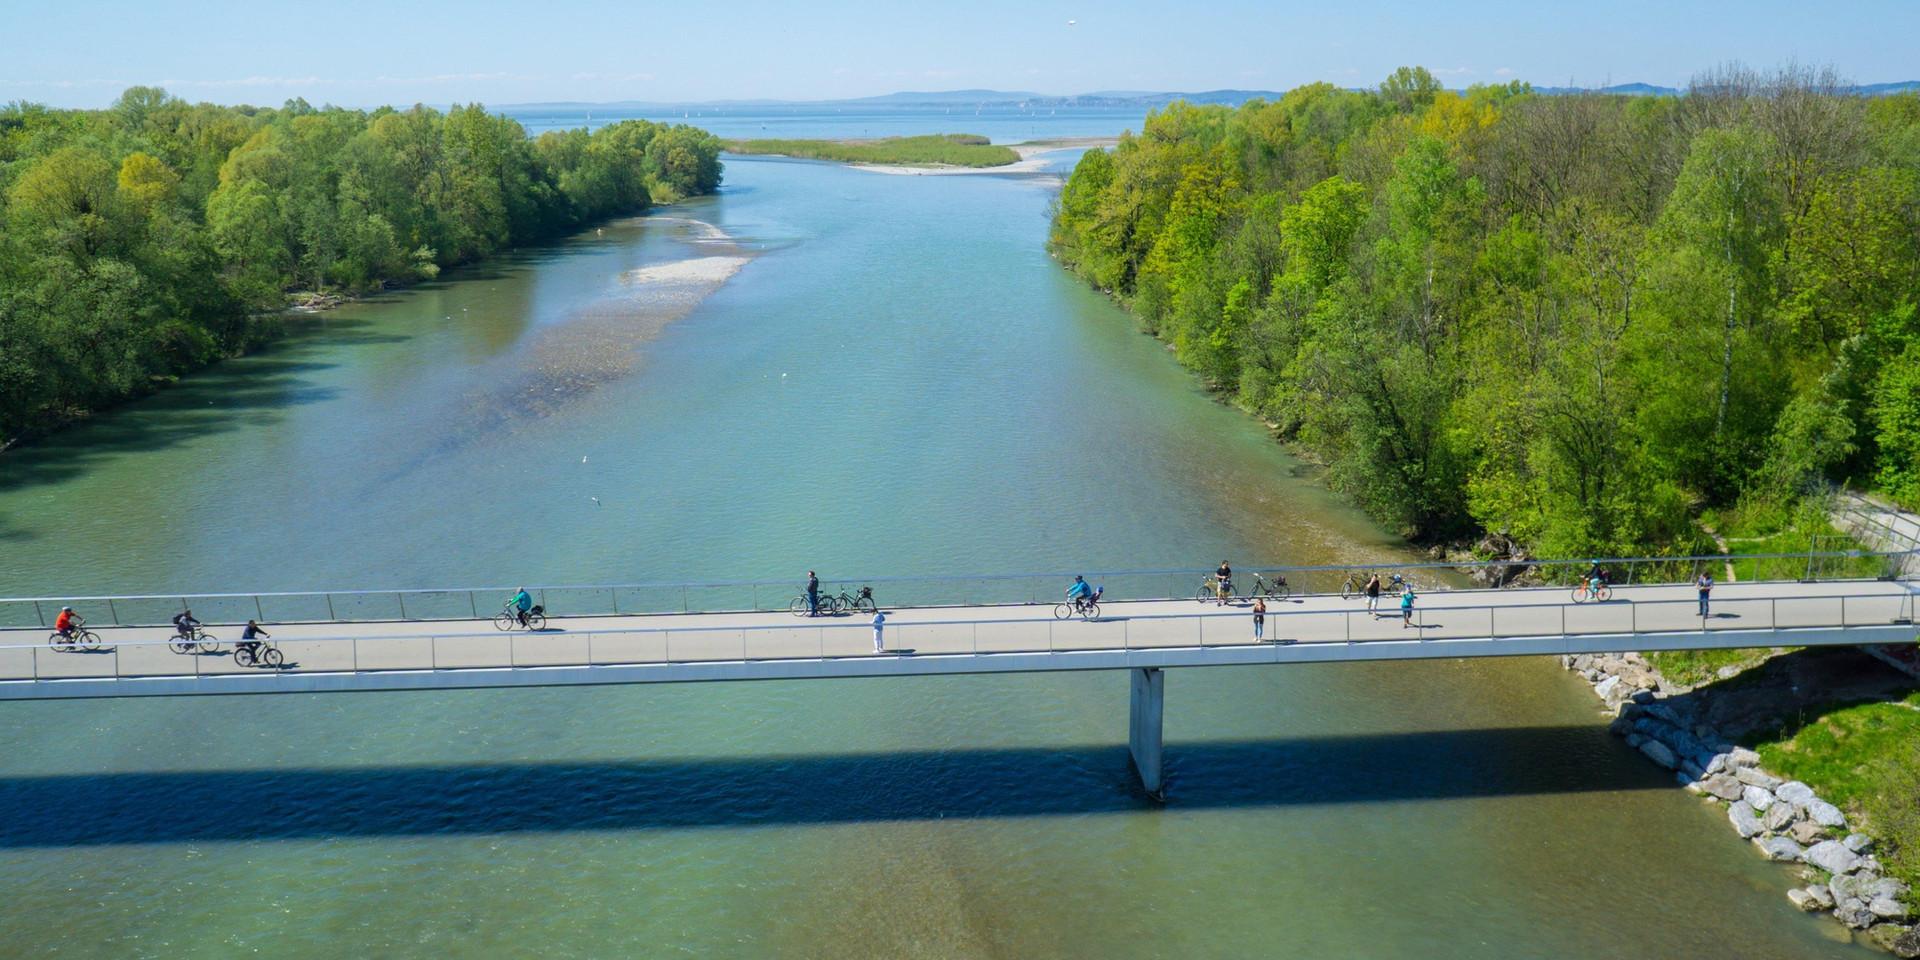 Eurovélo 6 bridge near Ufer (Austria, Day 2)